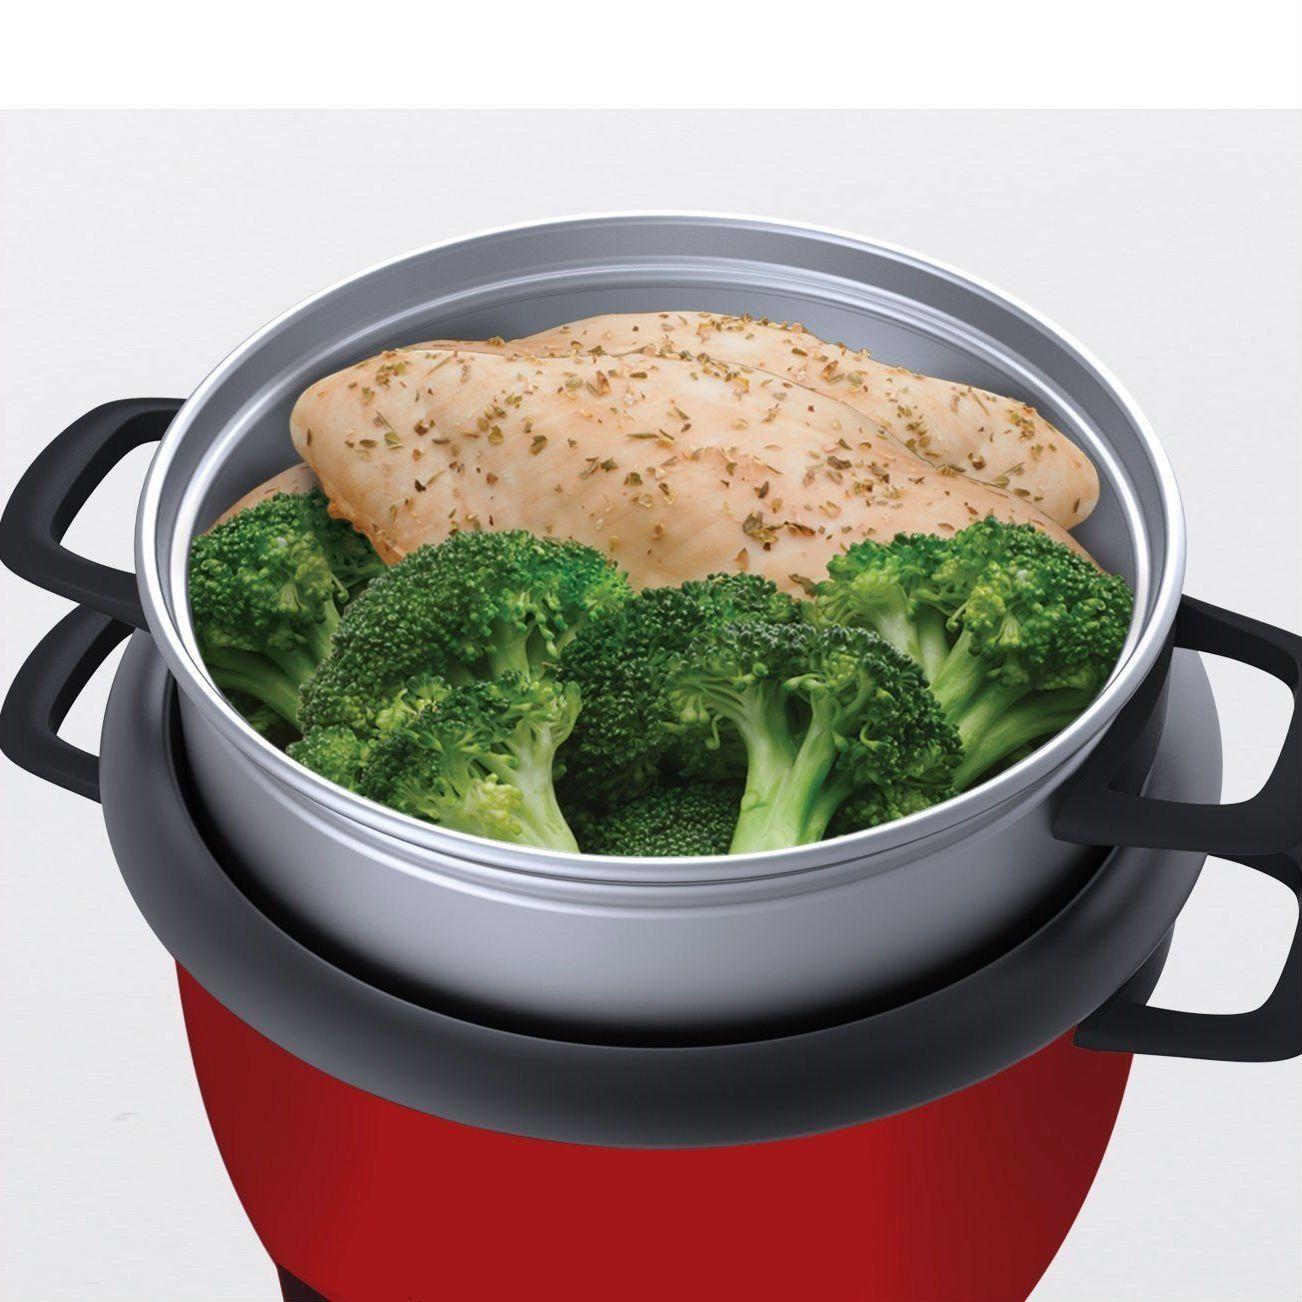 images?q=tbn:ANd9GcQh_l3eQ5xwiPy07kGEXjmjgmBKBRB7H2mRxCGhv1tFWg5c_mWT Kitchenaid Rice Cooker Red